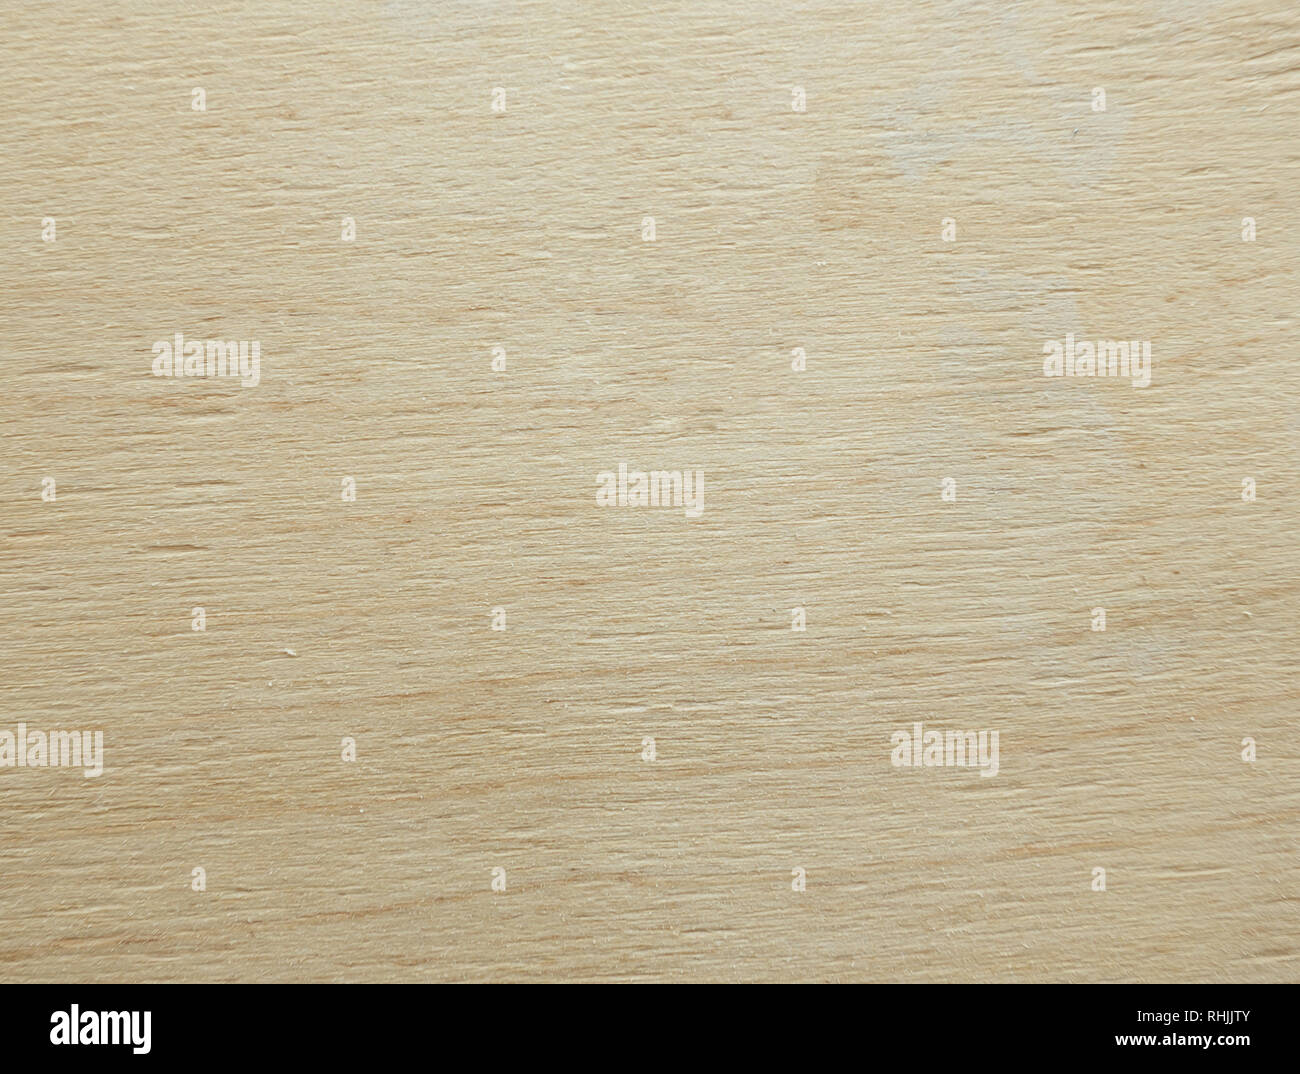 Light soft wood texture. - Stock Image